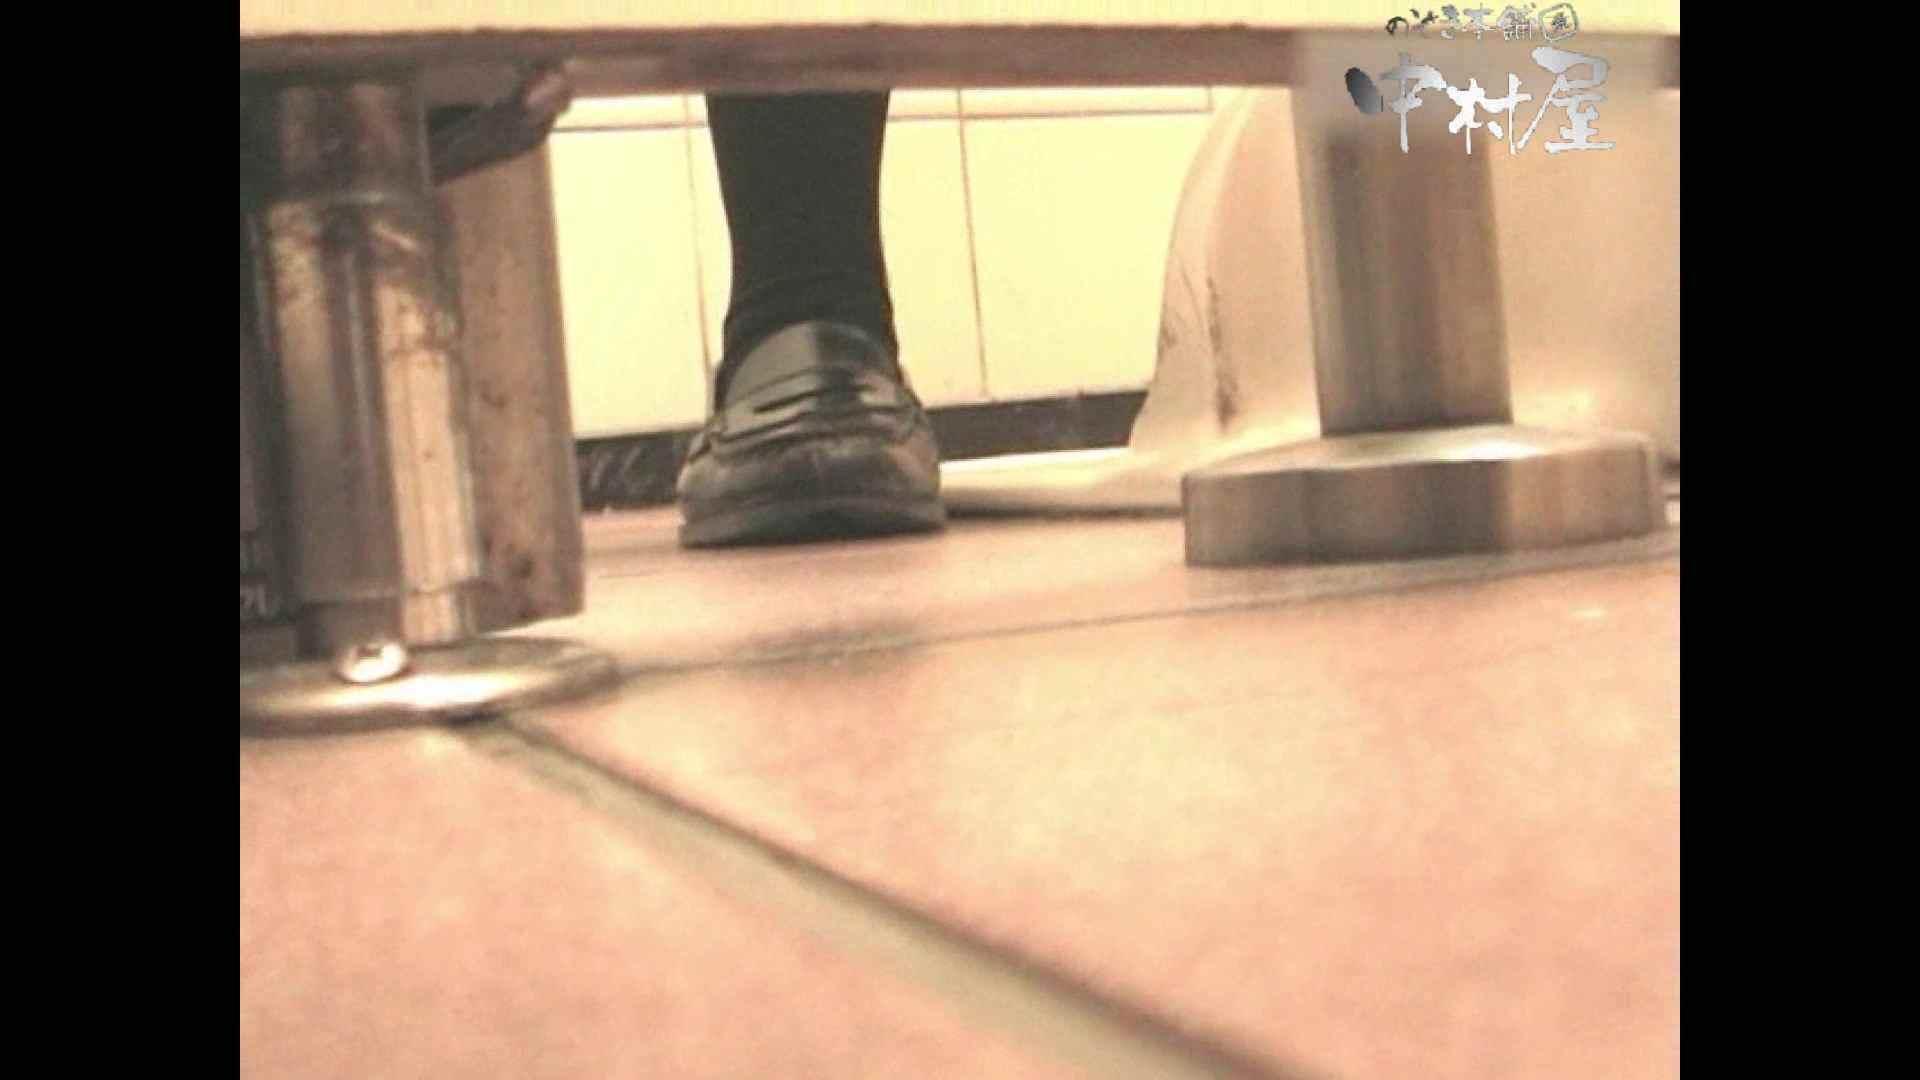 岩手県在住盗撮師盗撮記録vol.05 盗撮特撮 ぱこり動画紹介 11pic 3